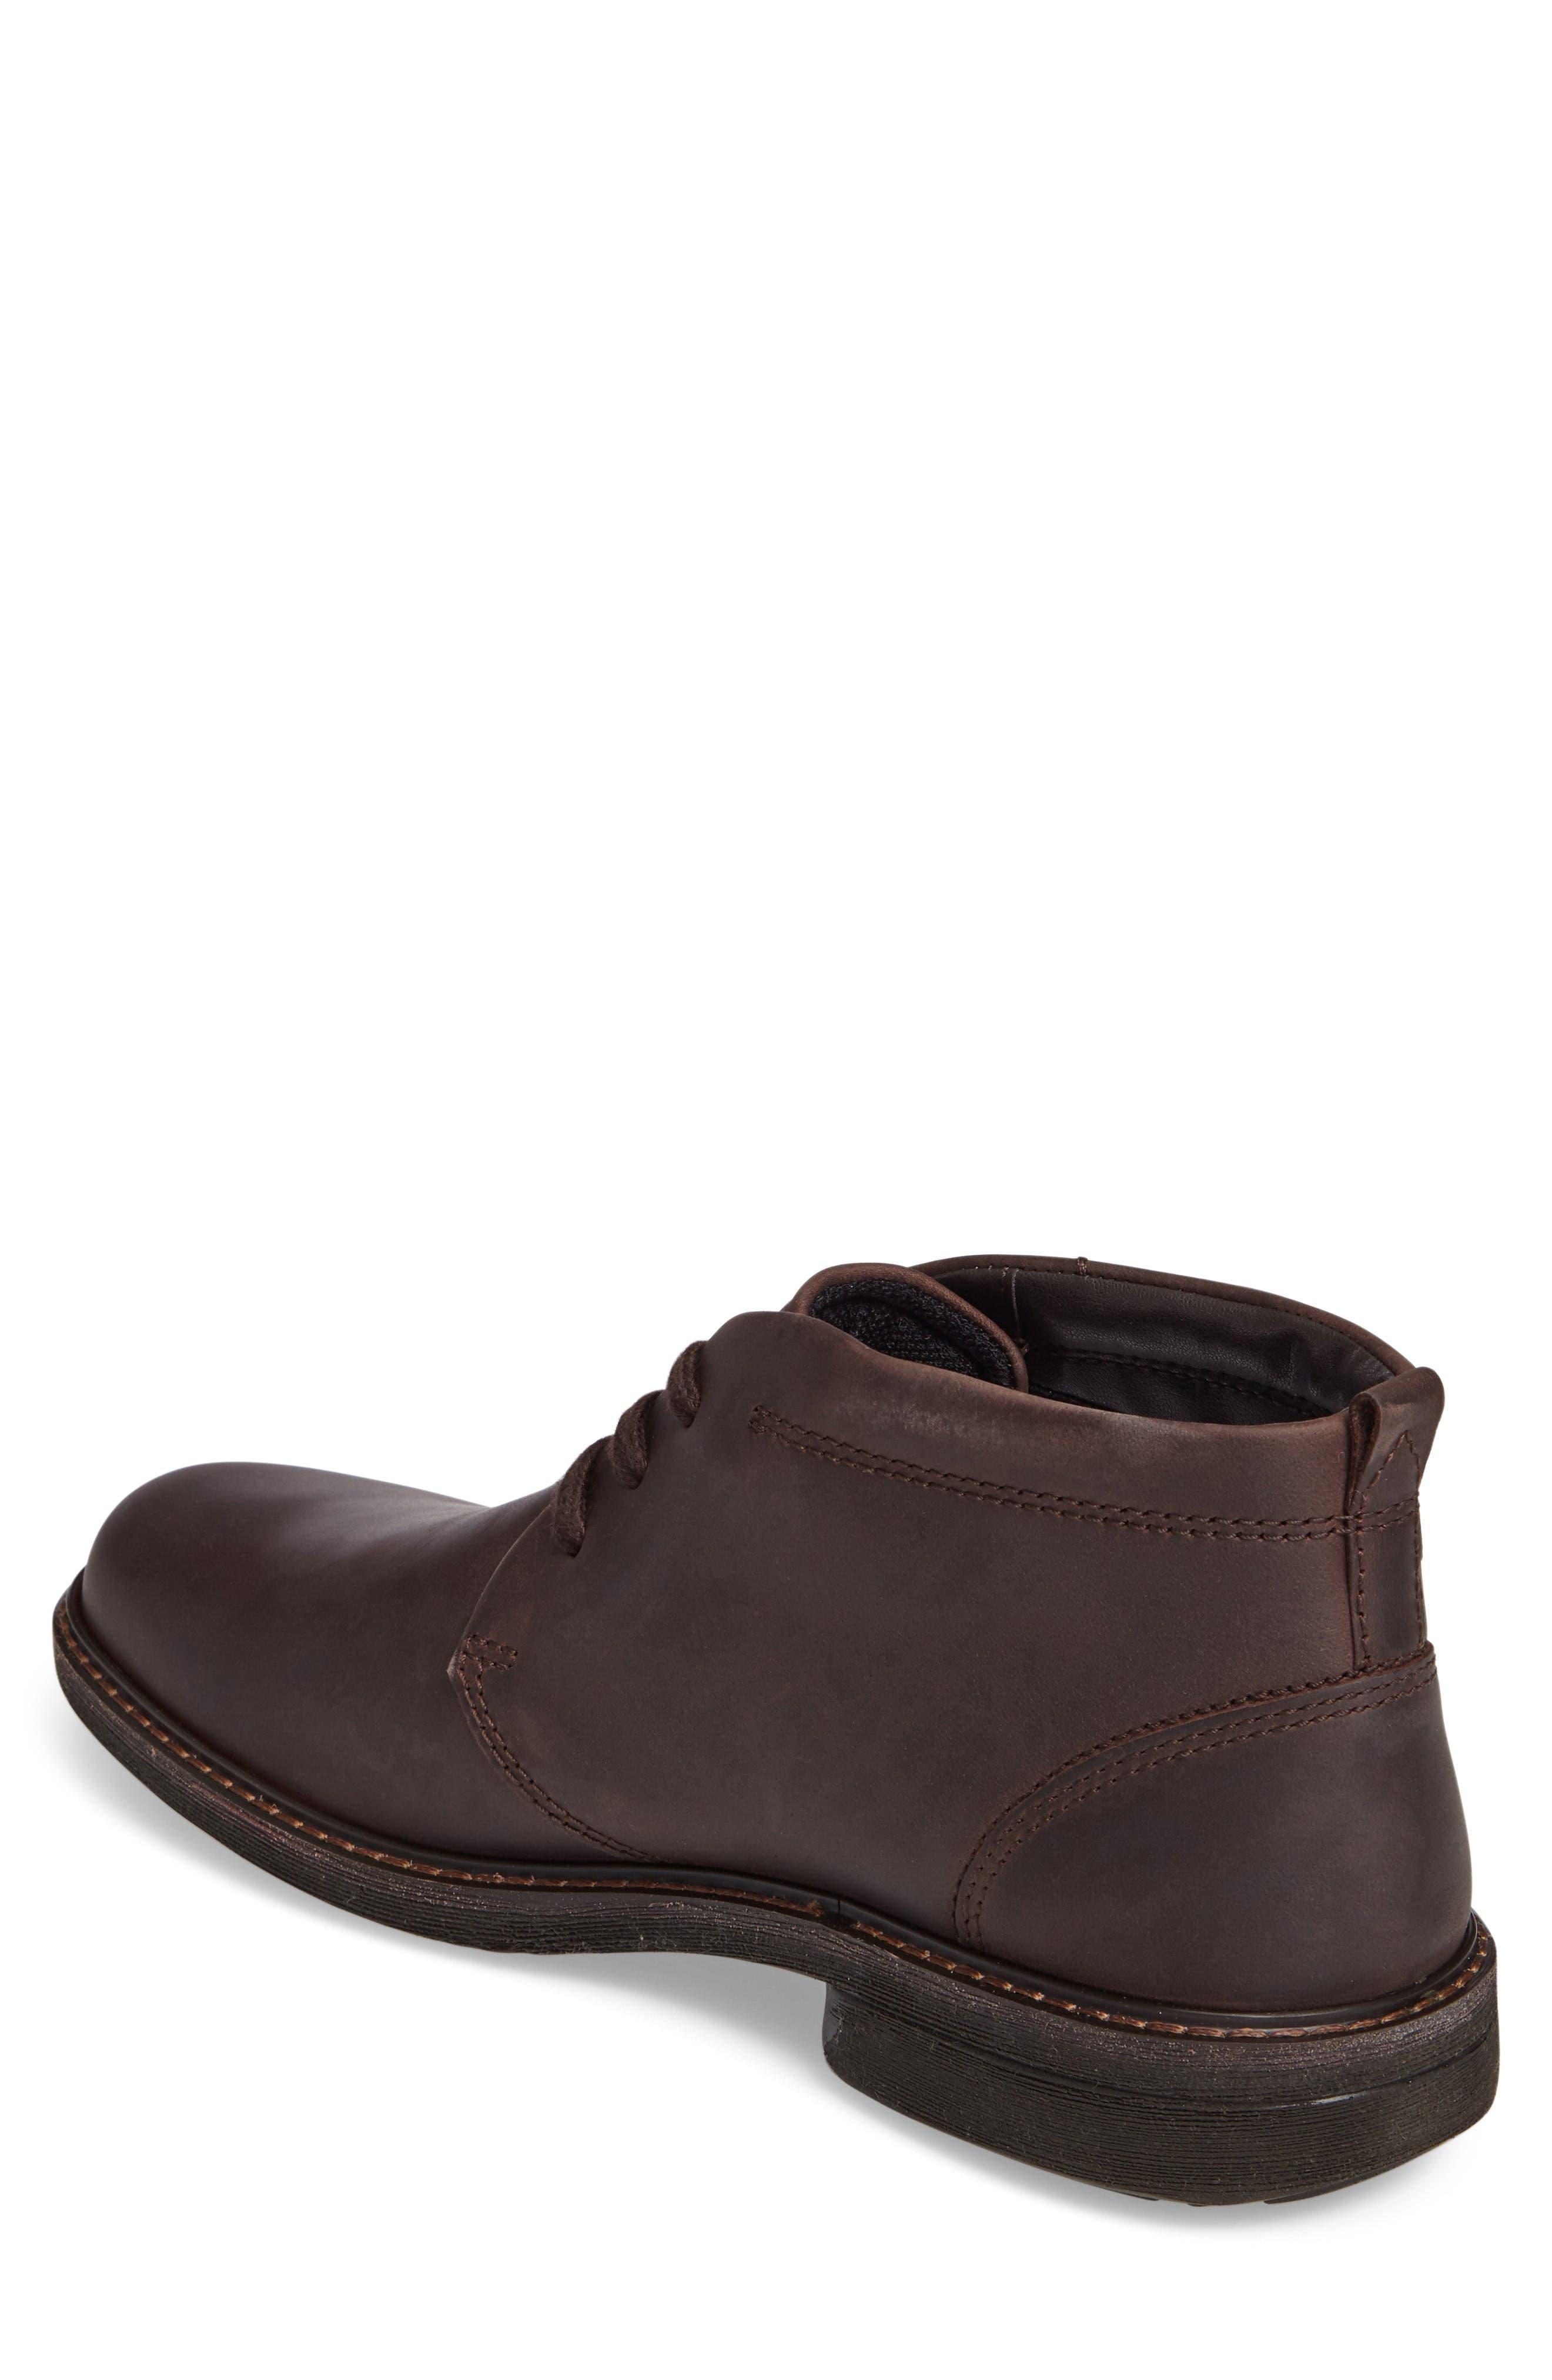 Turn Gore-Tex<sup>®</sup> Waterproof Chukka Boot,                             Alternate thumbnail 2, color,                             Mocha Nubuck Leather